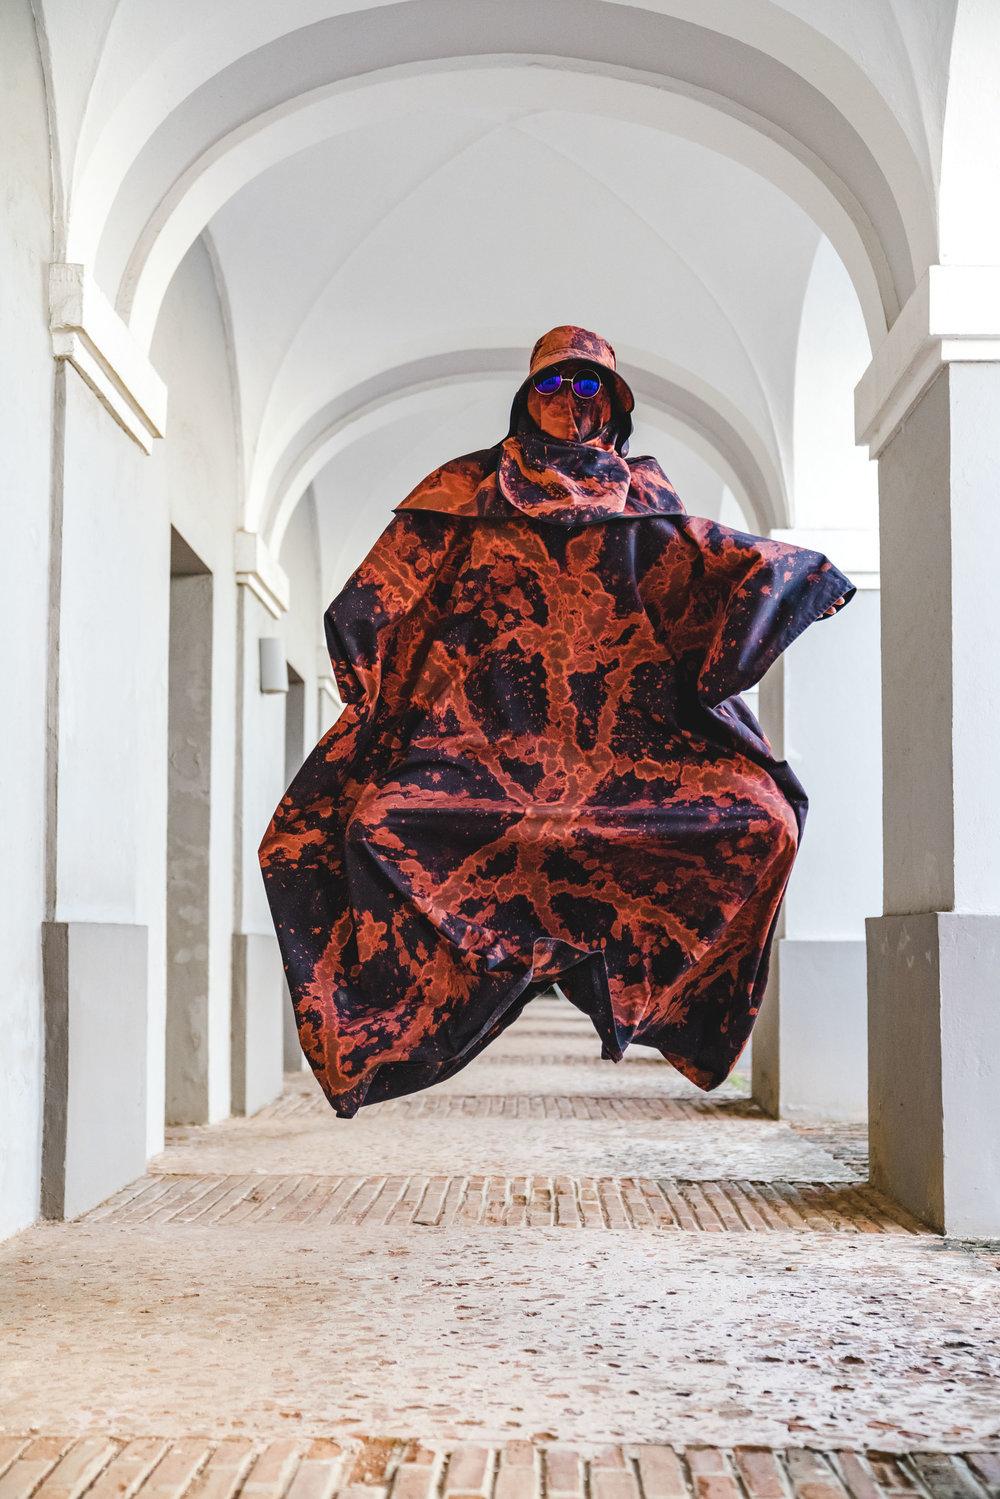 Alexandre_Bavard_Bulky_Performance_at_Meca_Art_Fair.JPG